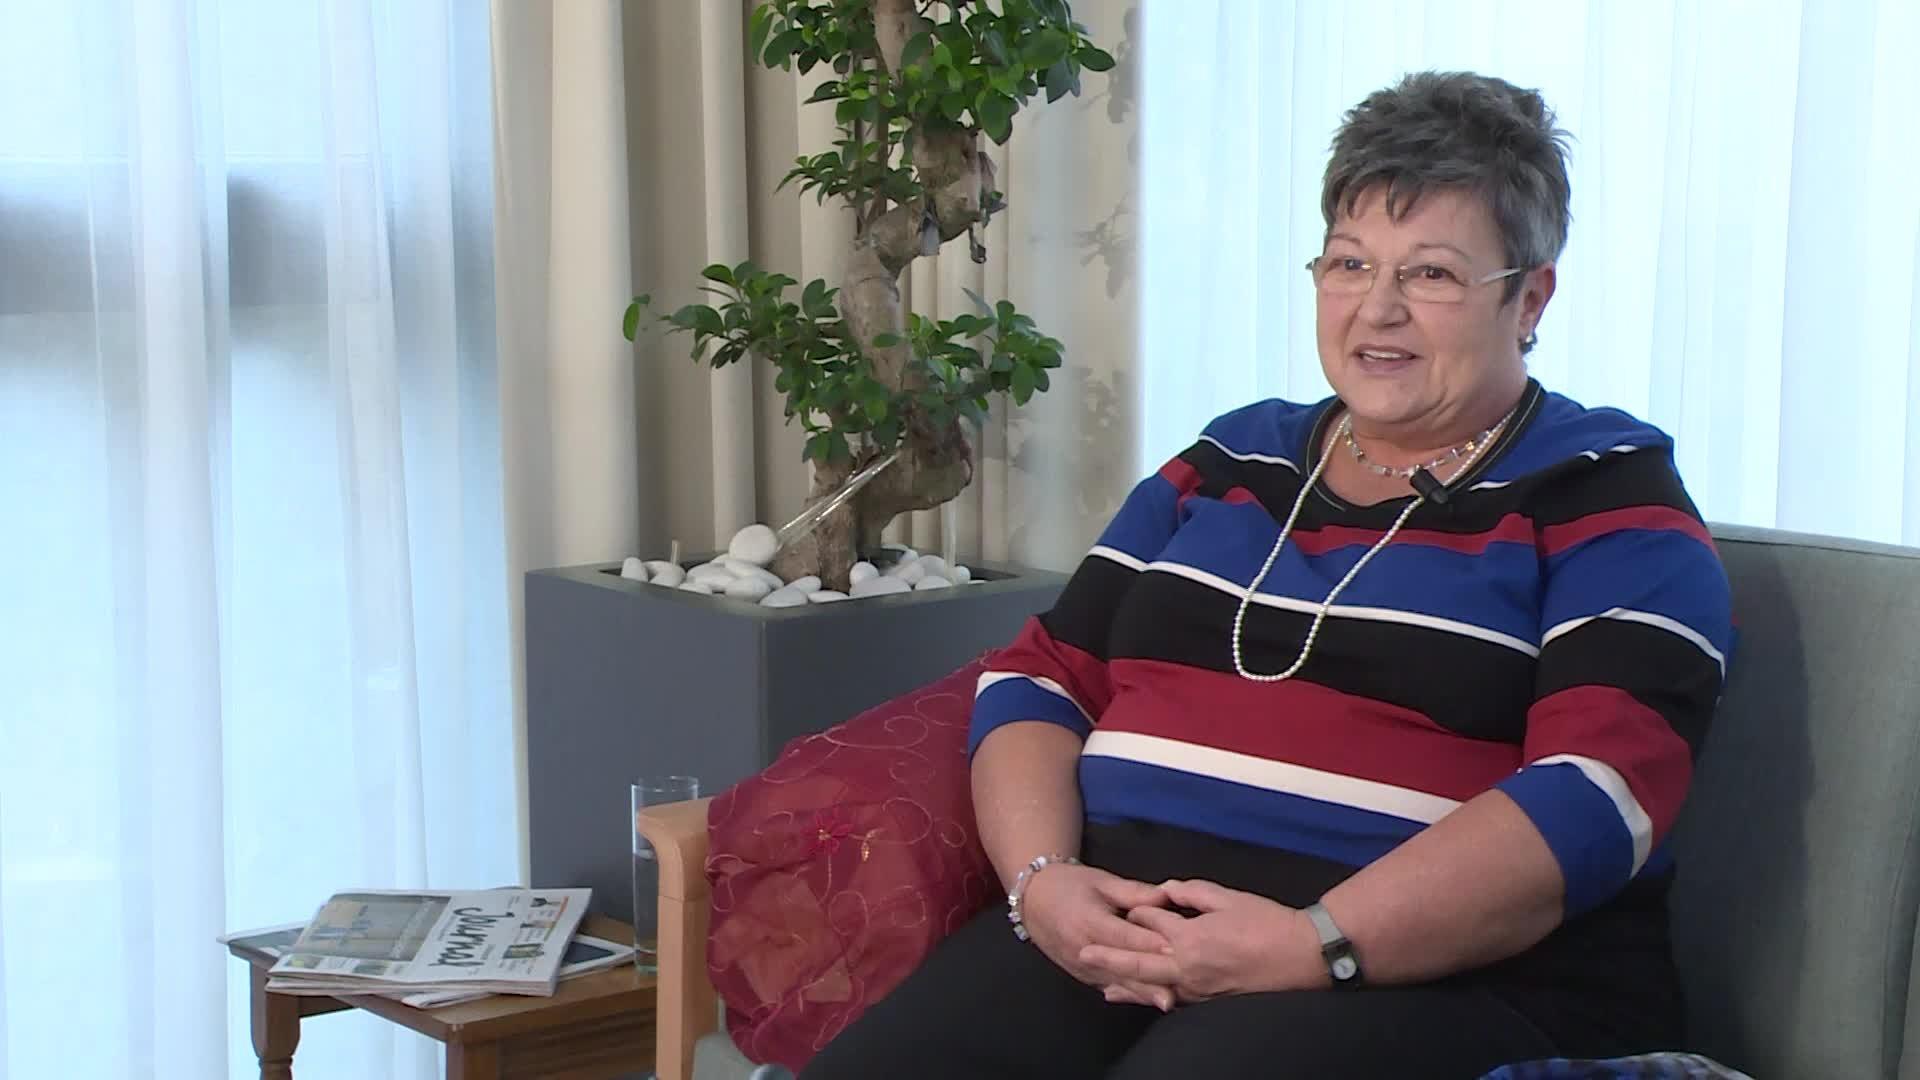 Demenz - Familie 3 - Edmée: Diagnose Alzheimer